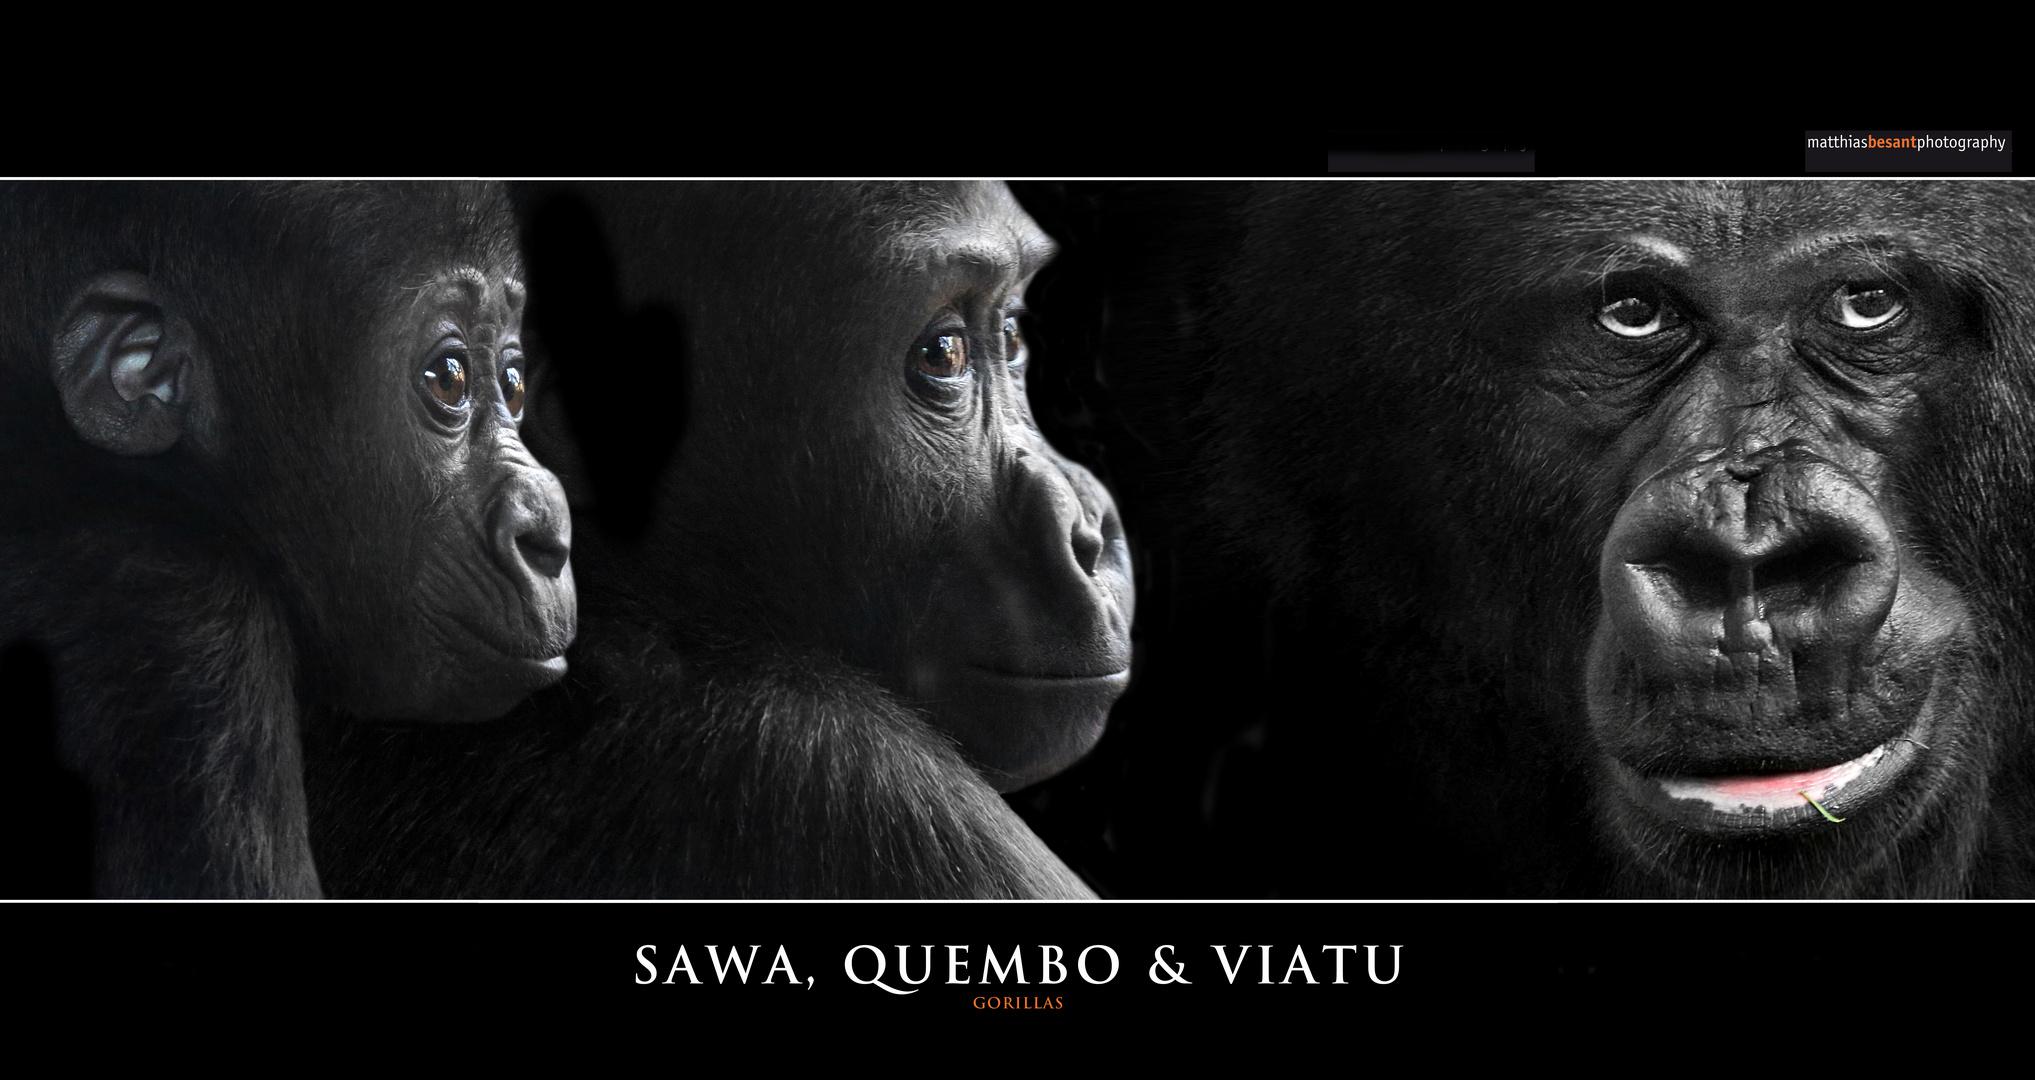 SAWA, QUEMBO & VIATU